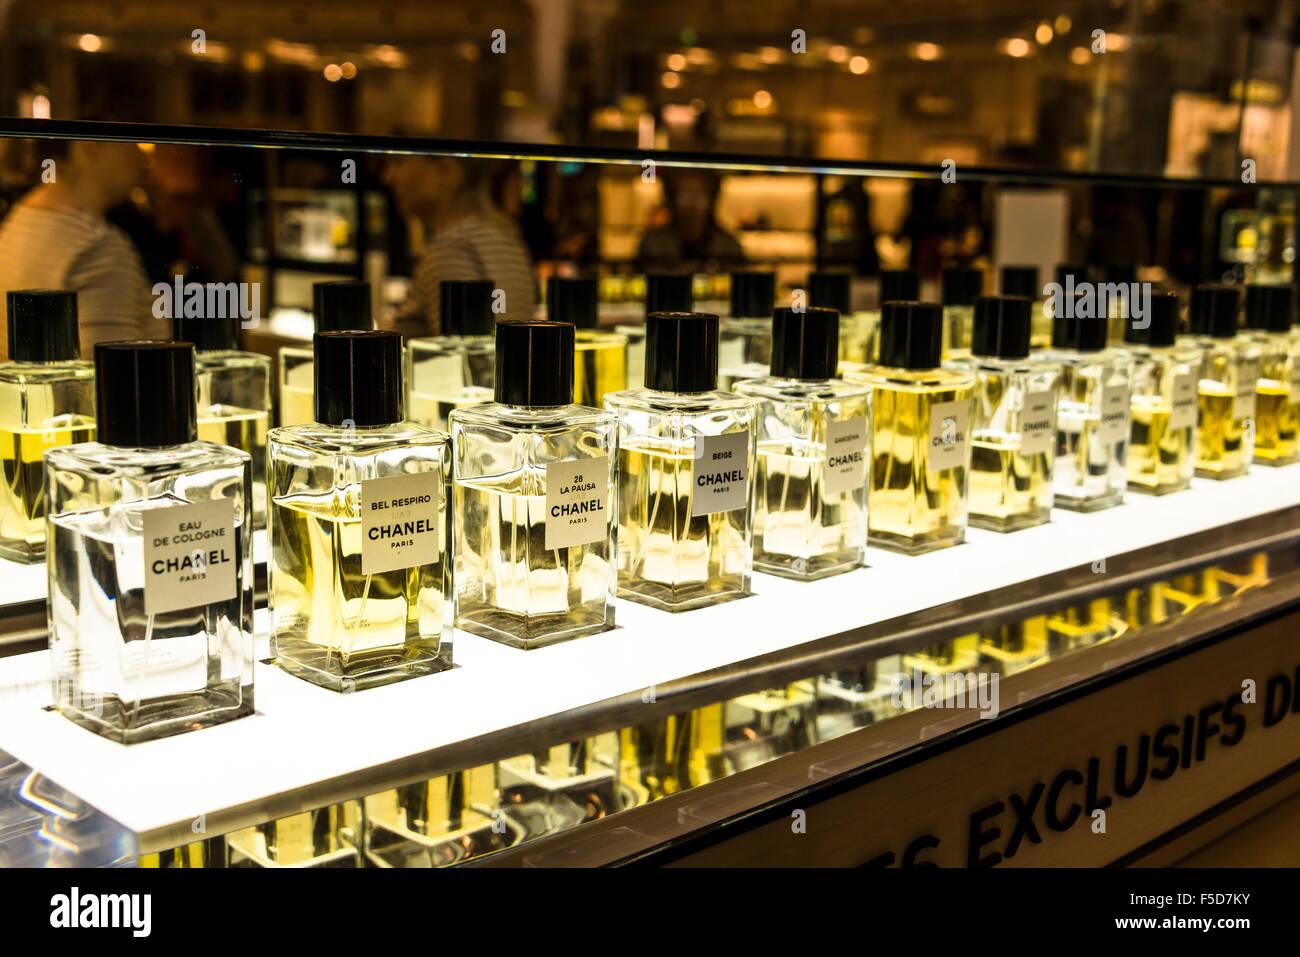 Perfume, Chanel perfume bottles on display for sale, Galeries Lafayette, Paris, Ile-de-France, France - Stock Image